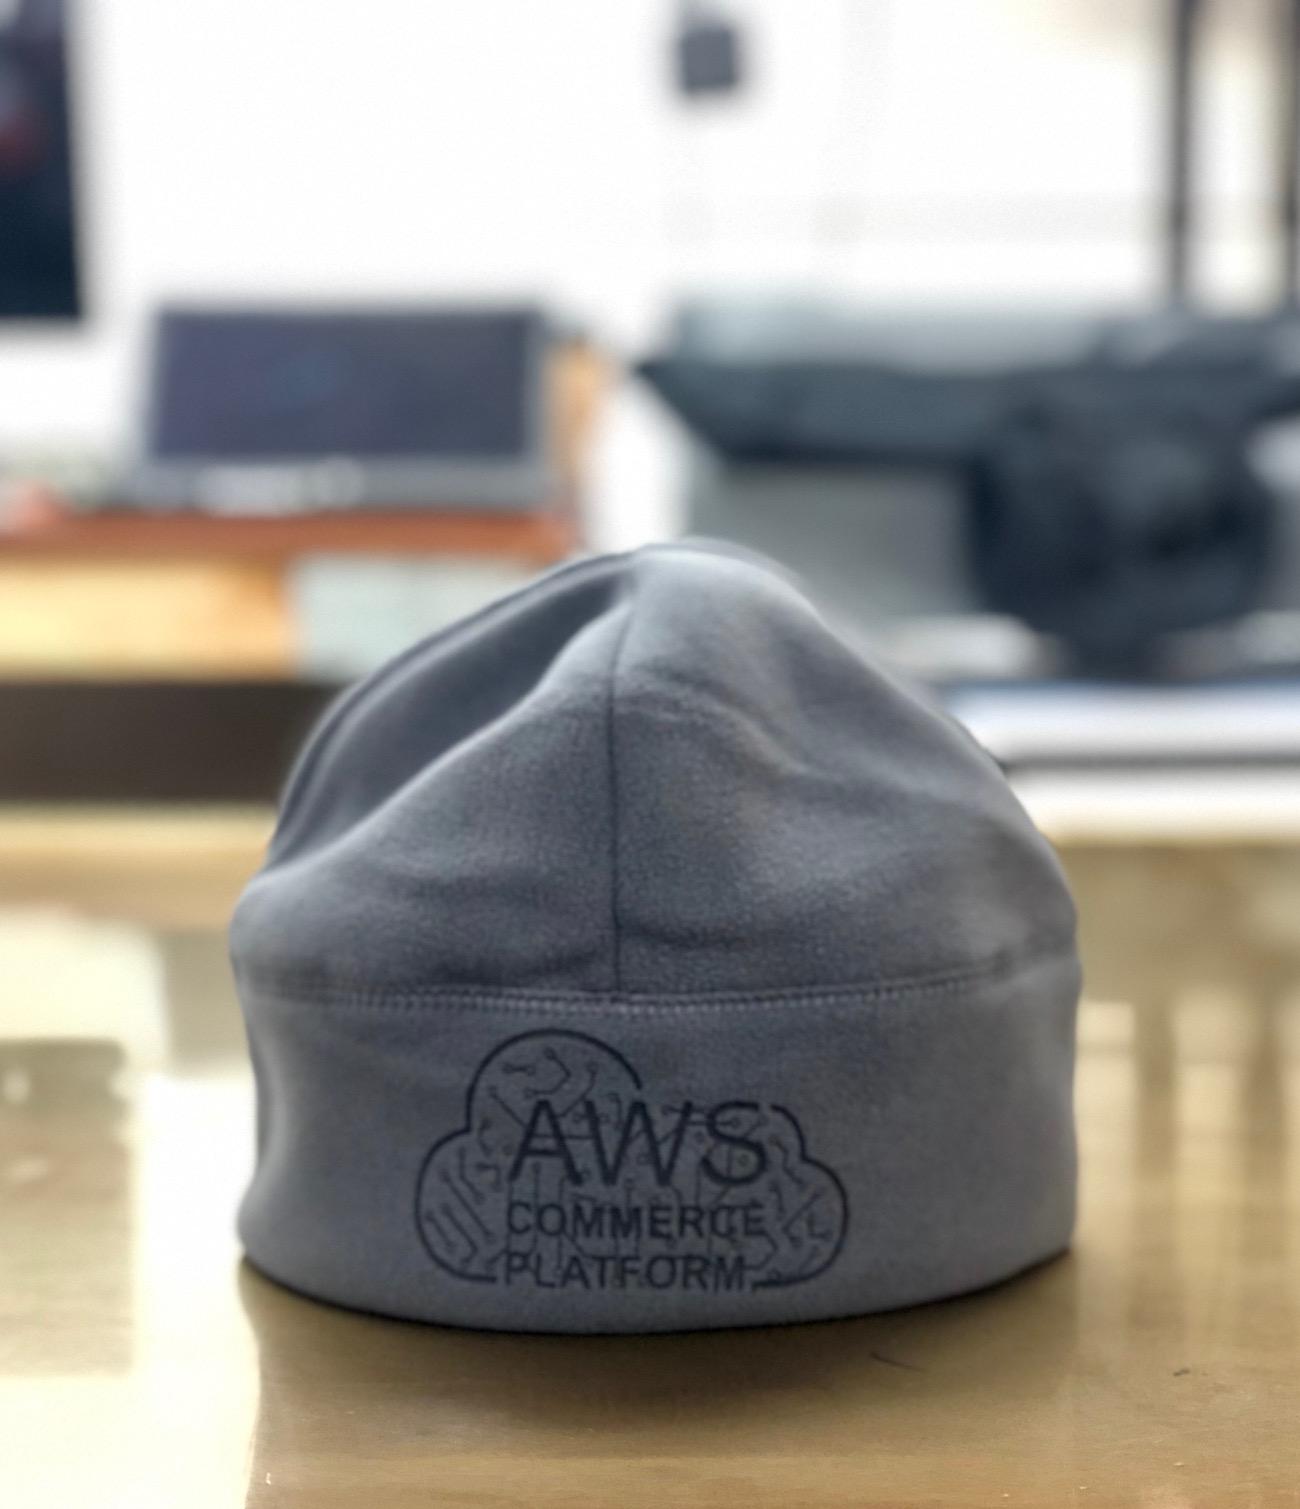 Laser Etched Fleece Beanie for Amazon AWS